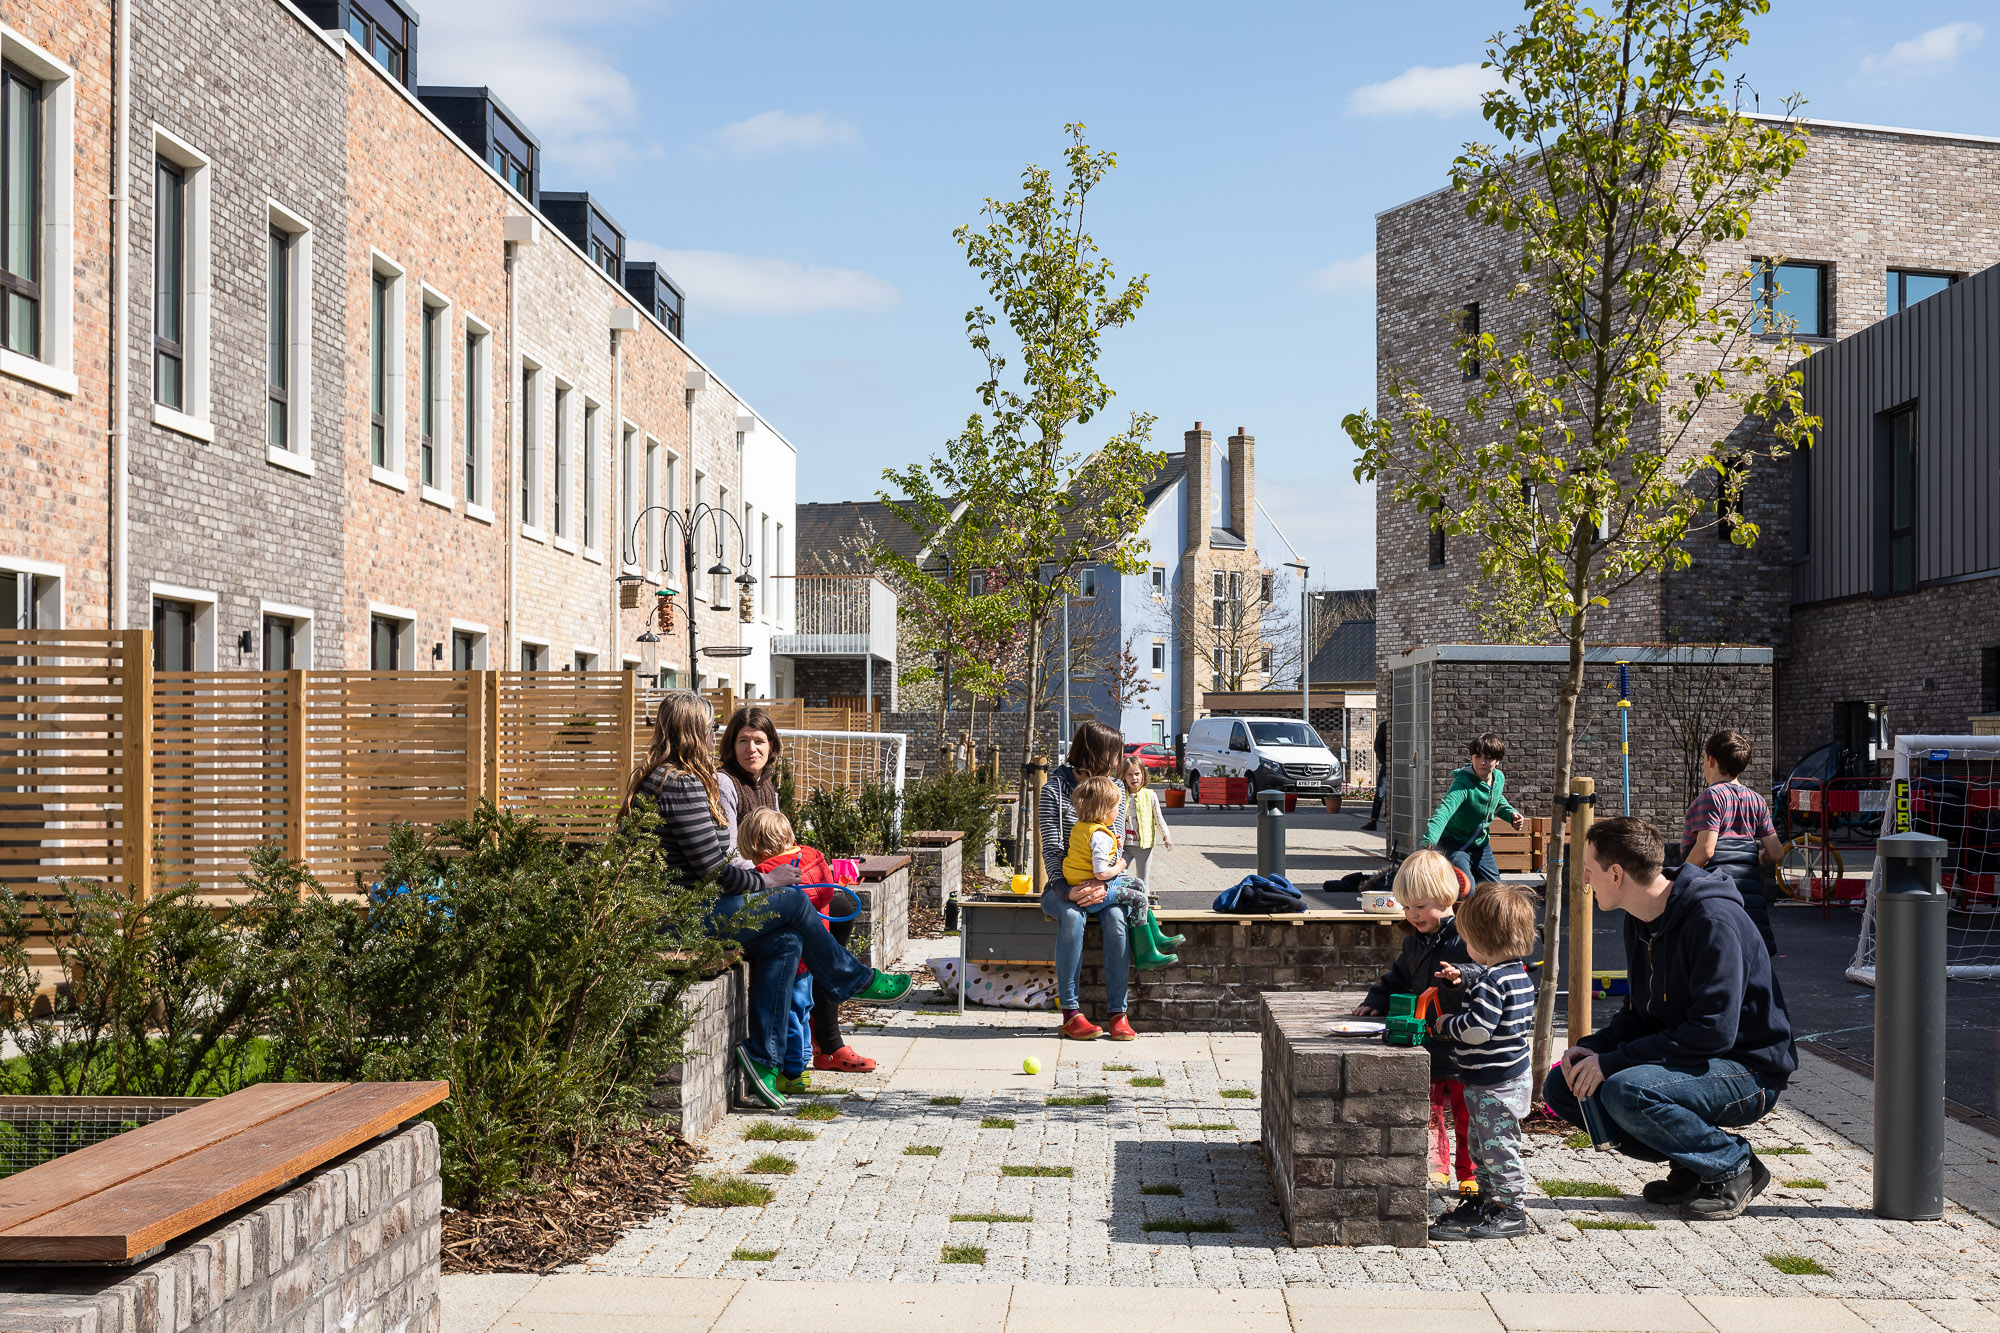 Marmalade Lane Co-Housing scheme by Mole Architects / TOWN